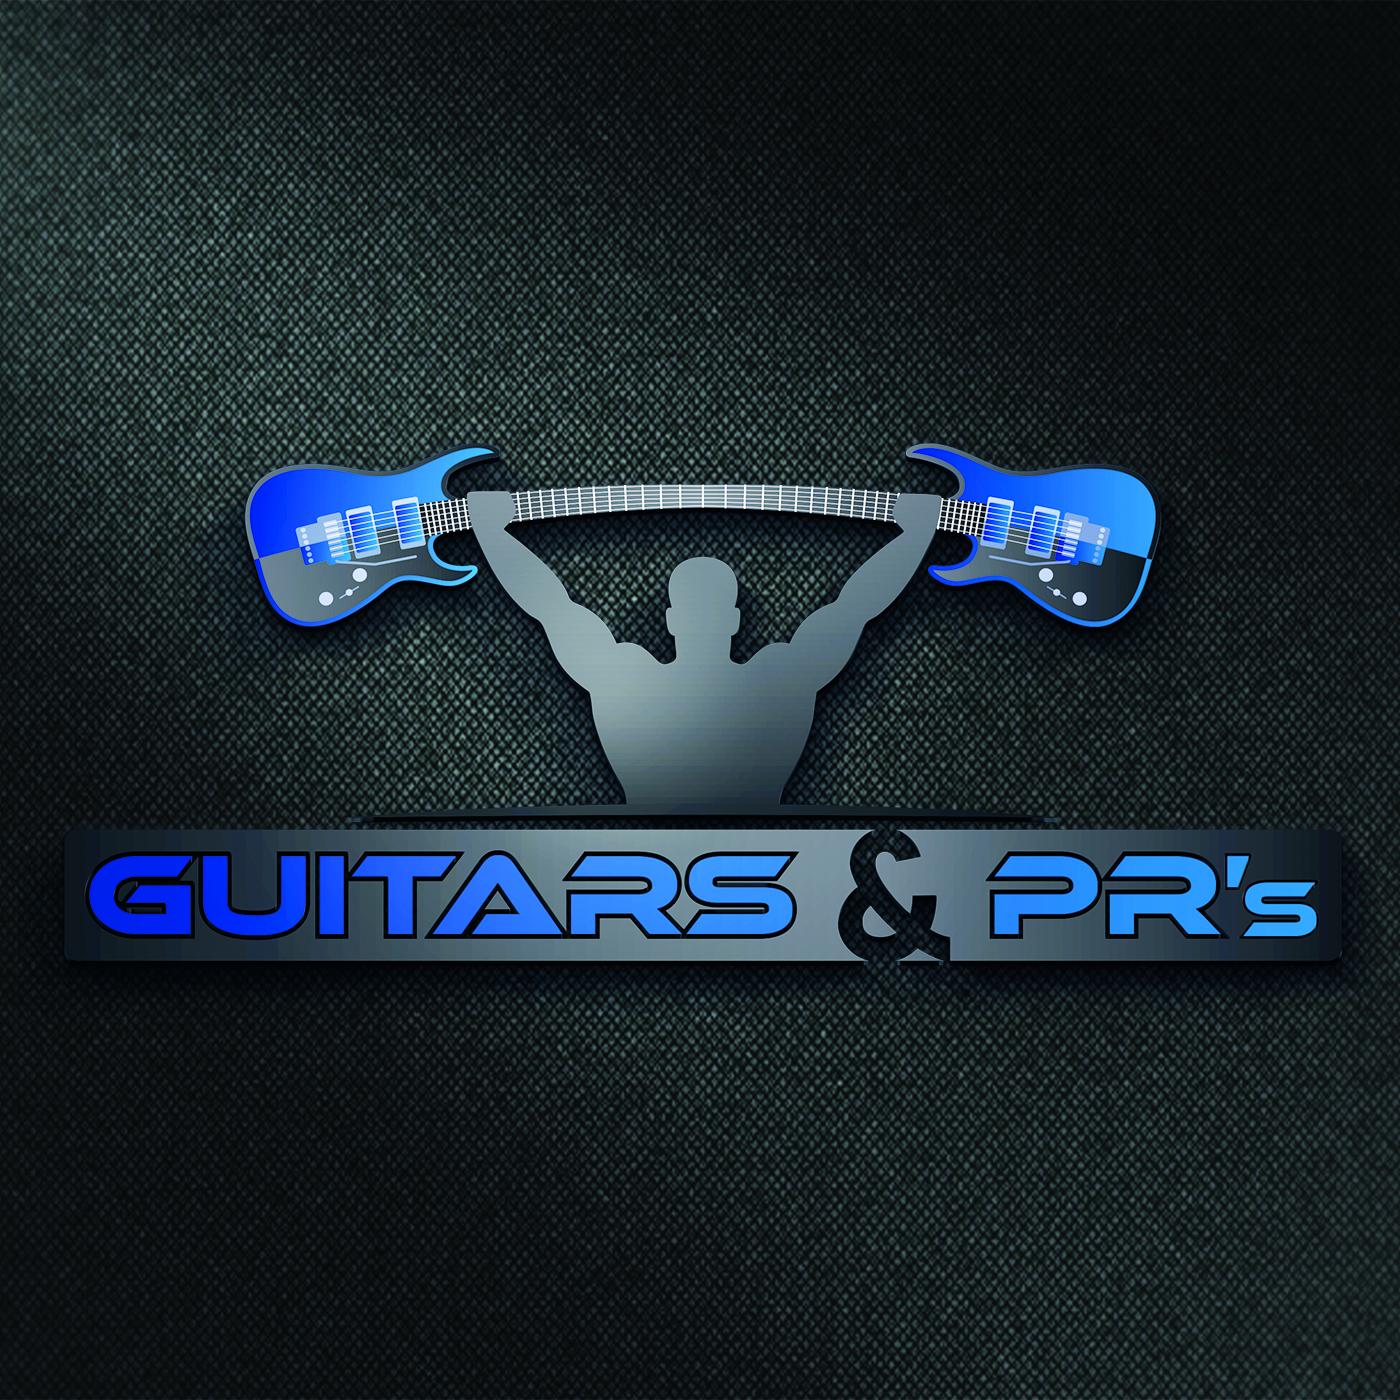 Guitars & PR's